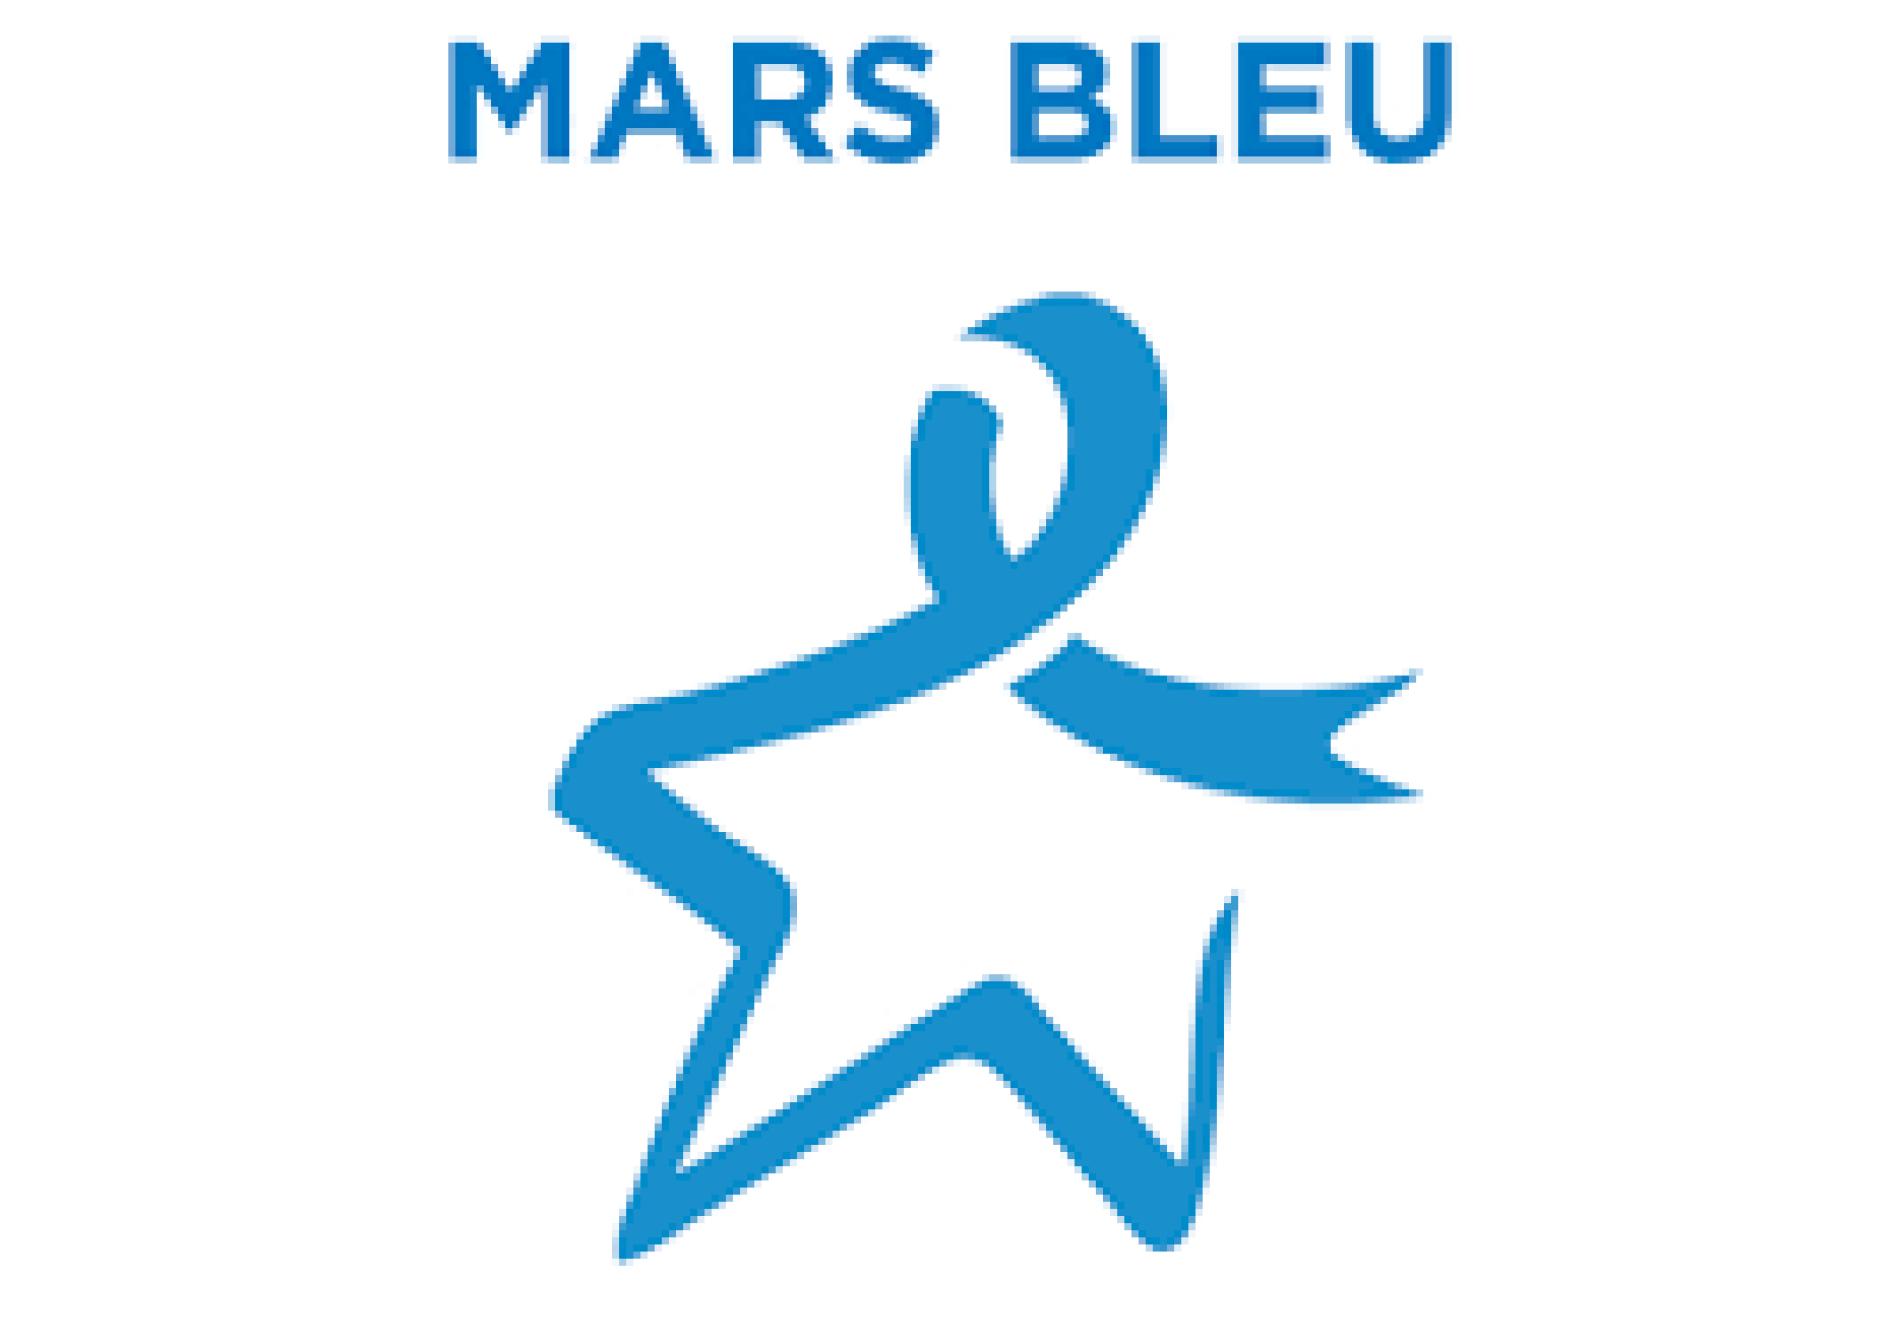 MARS BLEU : MOIS DU DEPISTAGE DU CANCER COLORECTAL